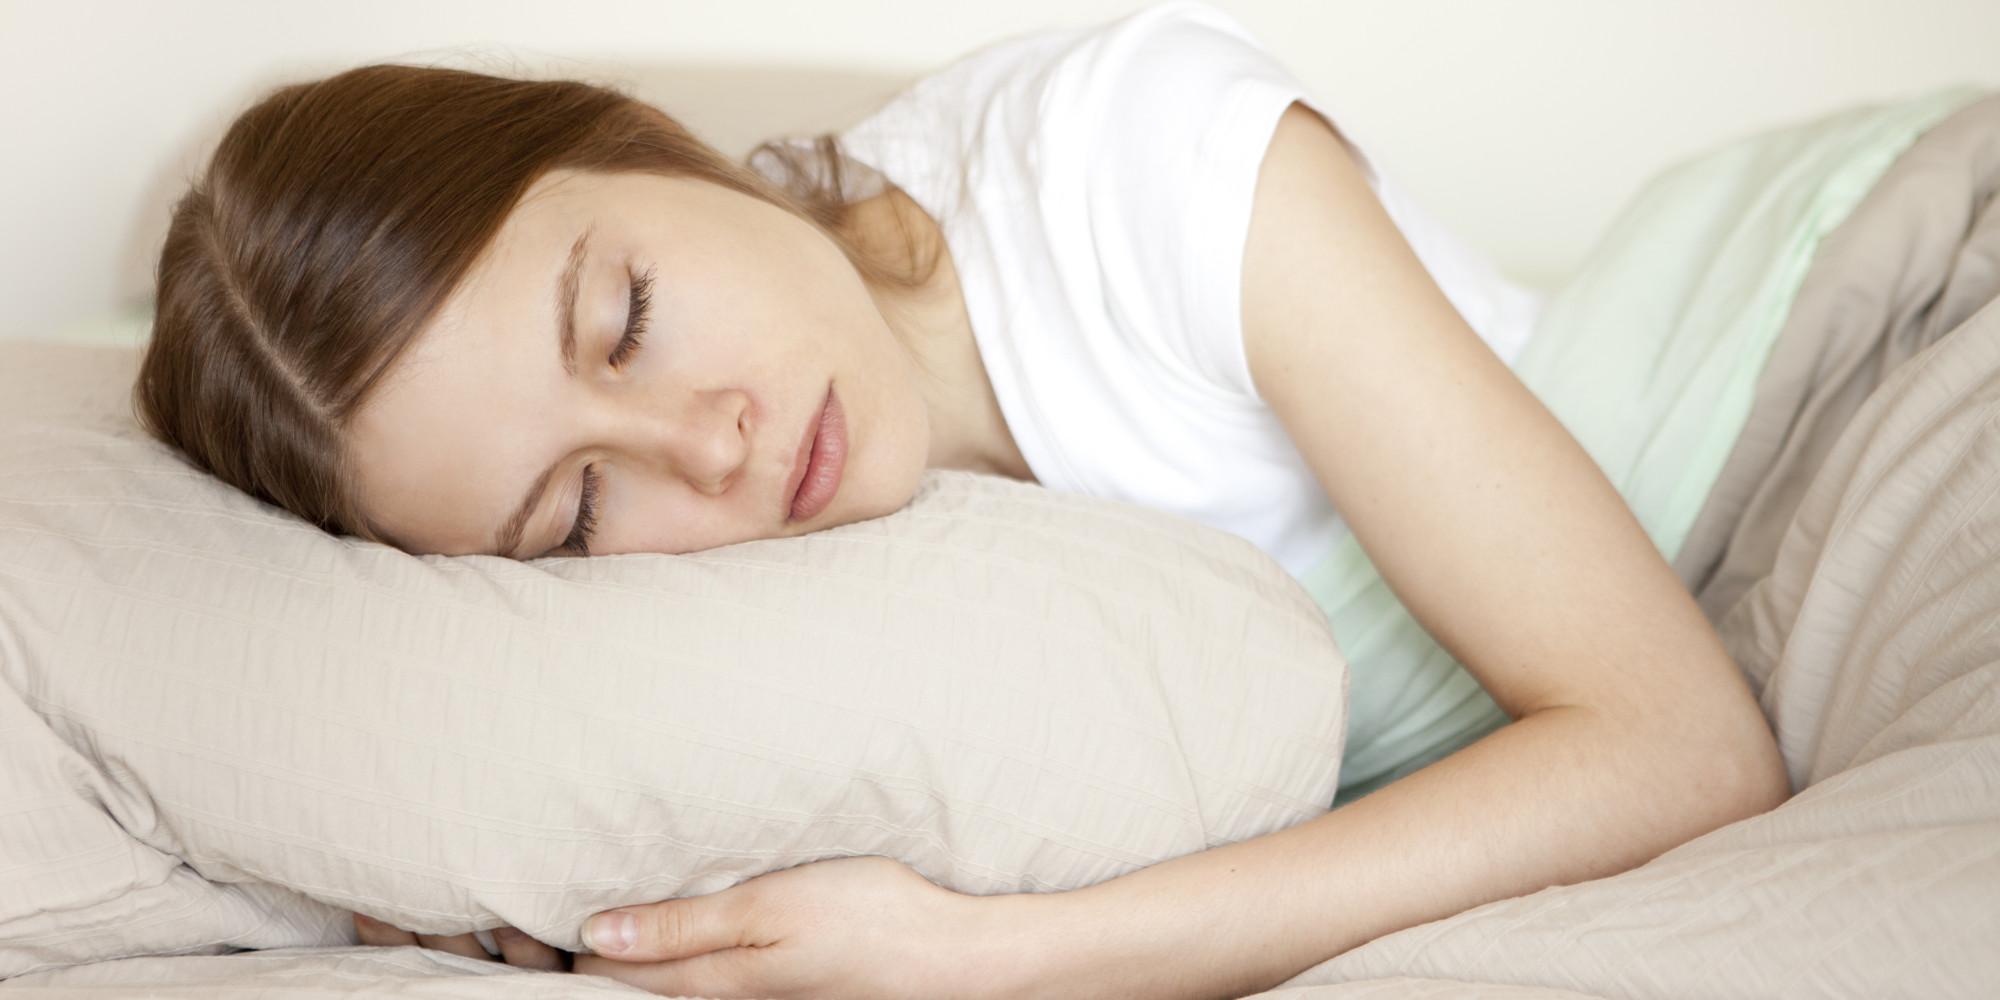 o-WOMAN-SLEEPING-PILLOW-facebook Buat Kamu yang Kurang Tidur, Lakukan 6 Cara Ini Agar Tetap Segar Saat Bangun di Pagi Hari